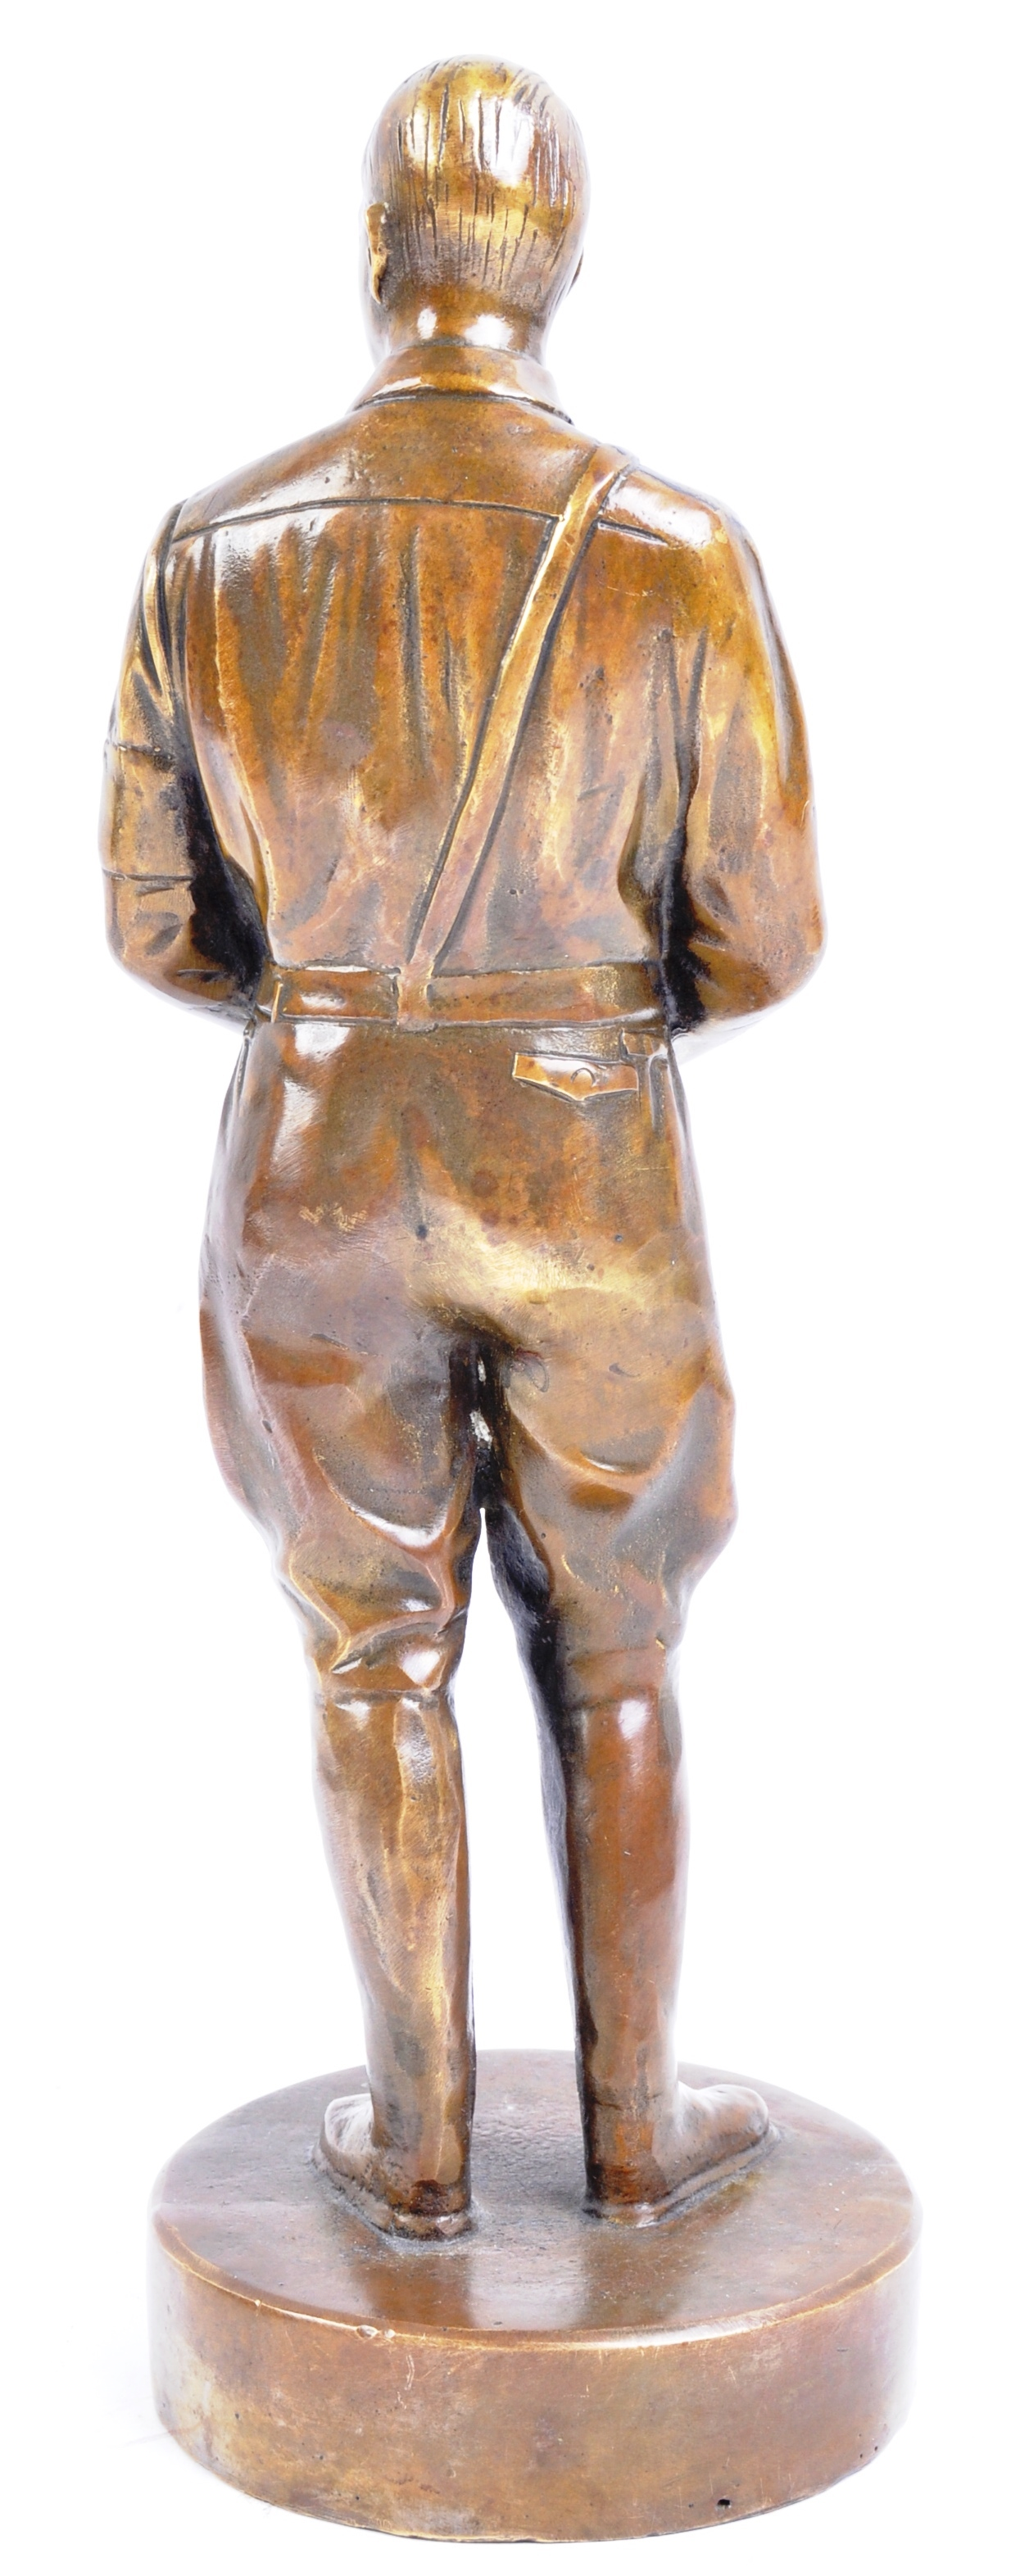 WWII SECOND WORLD WAR INTEREST - BRONZE STATUE OF ADOLF HITLER - Image 6 of 6